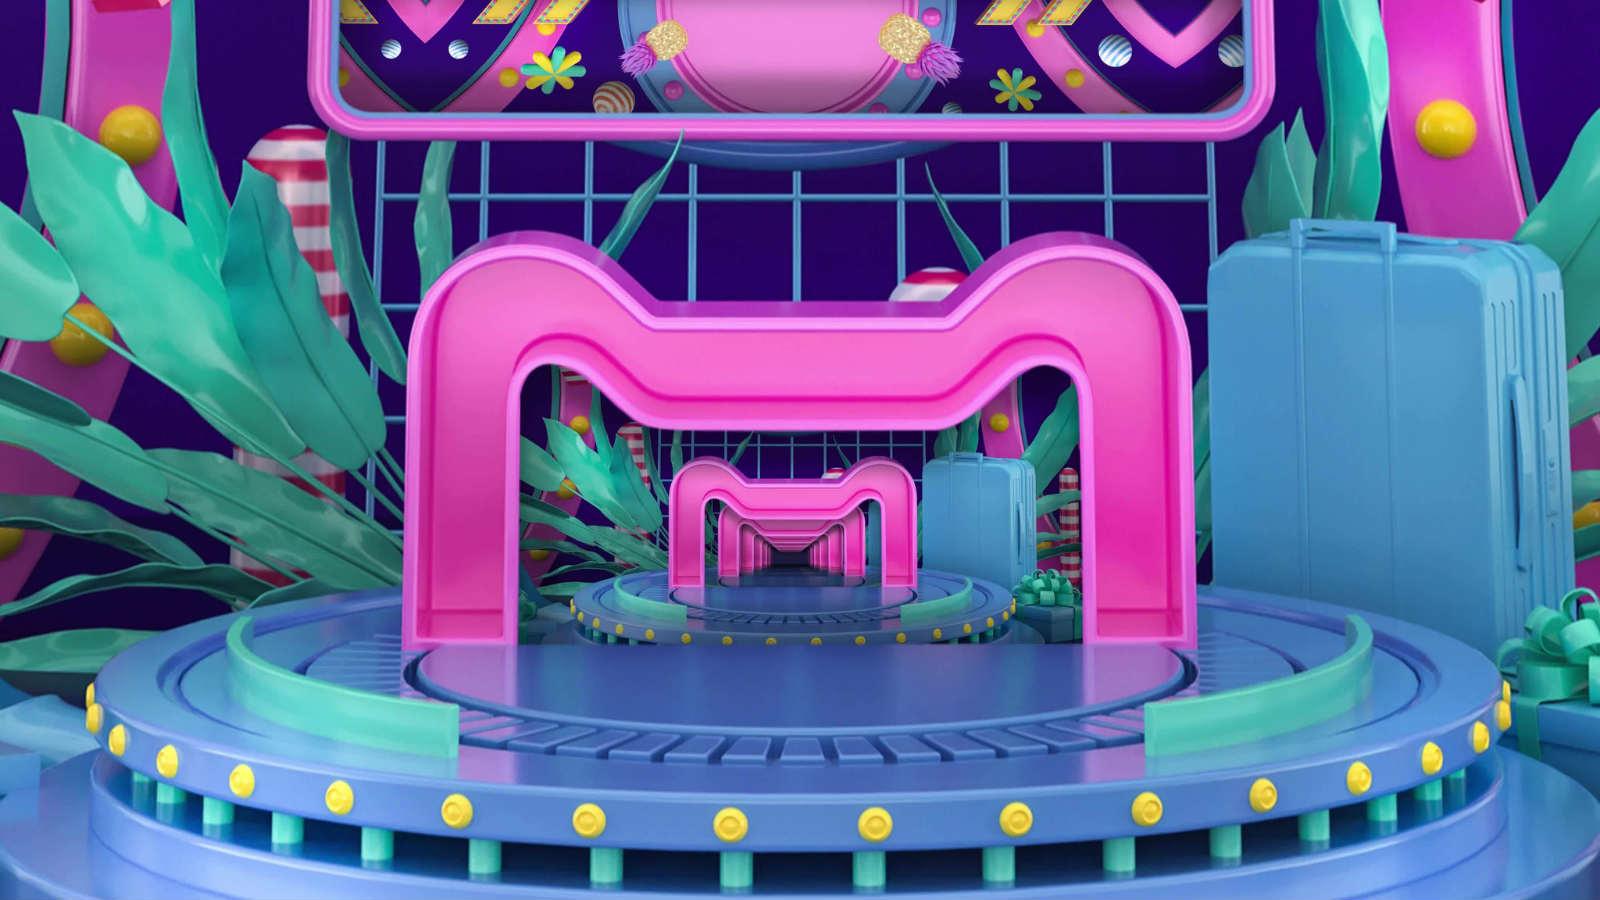 4K青春时尚欢乐盛典商品发布会背景视频素材